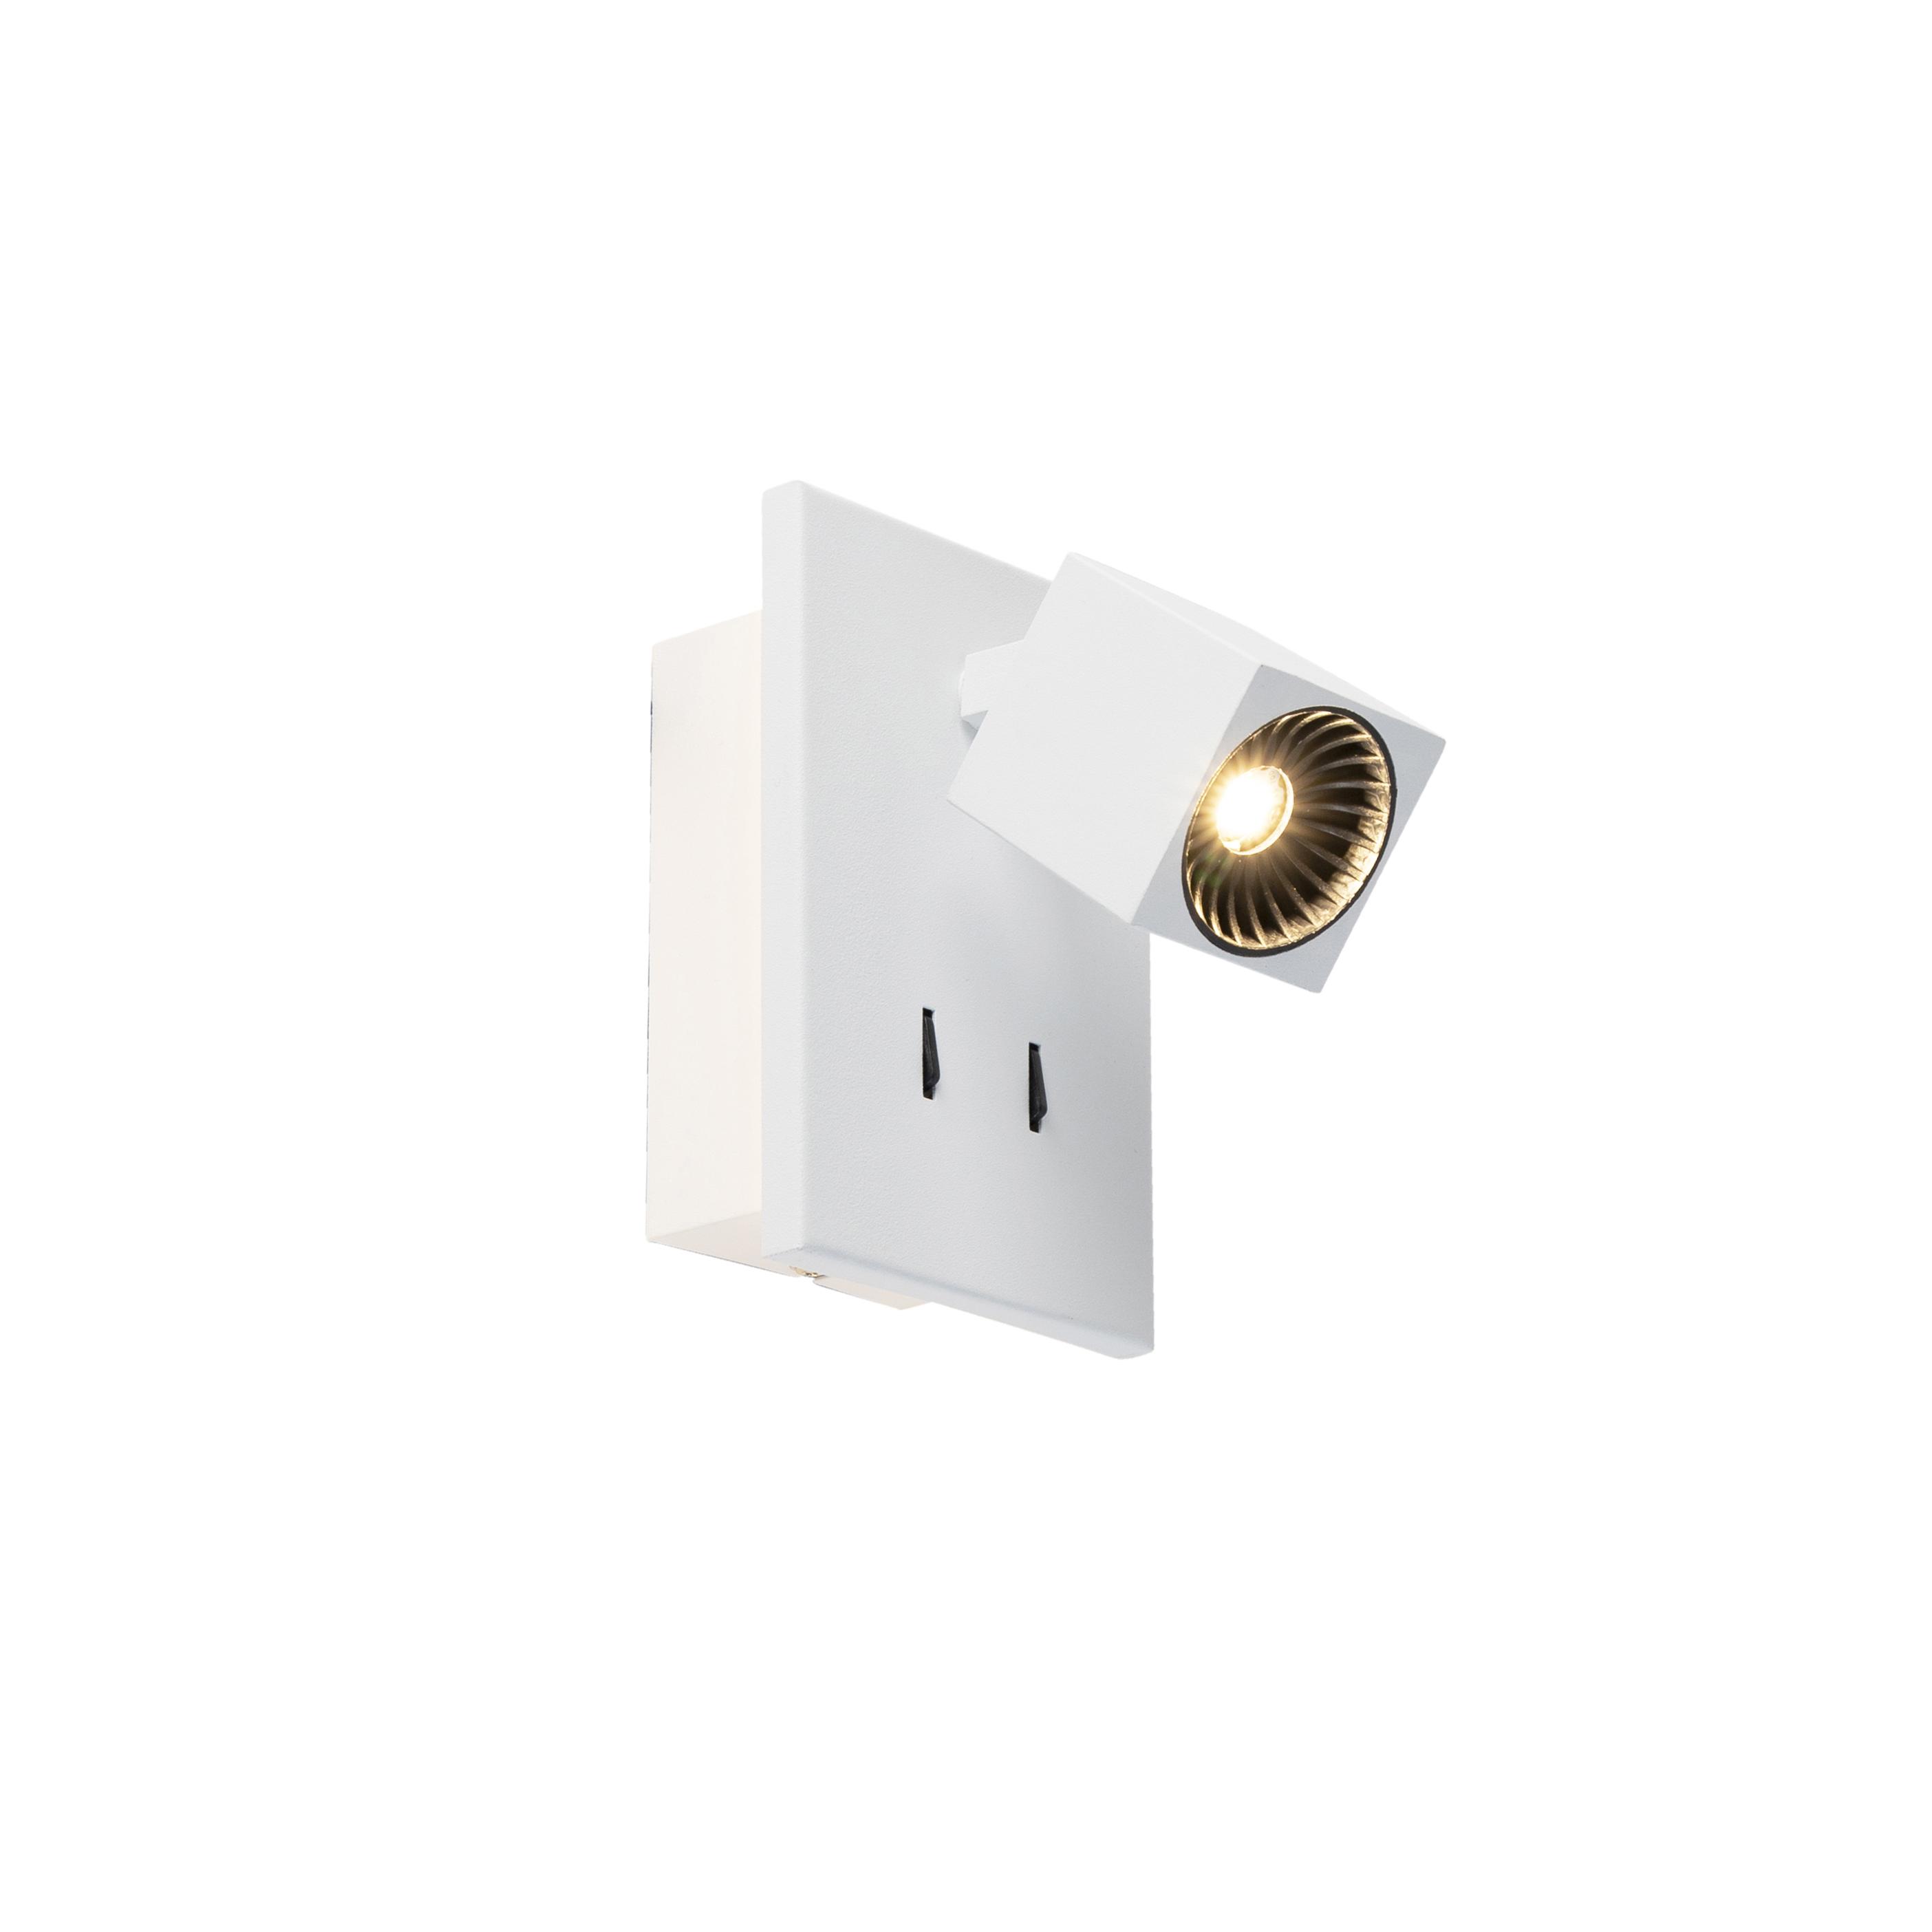 Moderne wandlamp wit incl. LED - Cupra